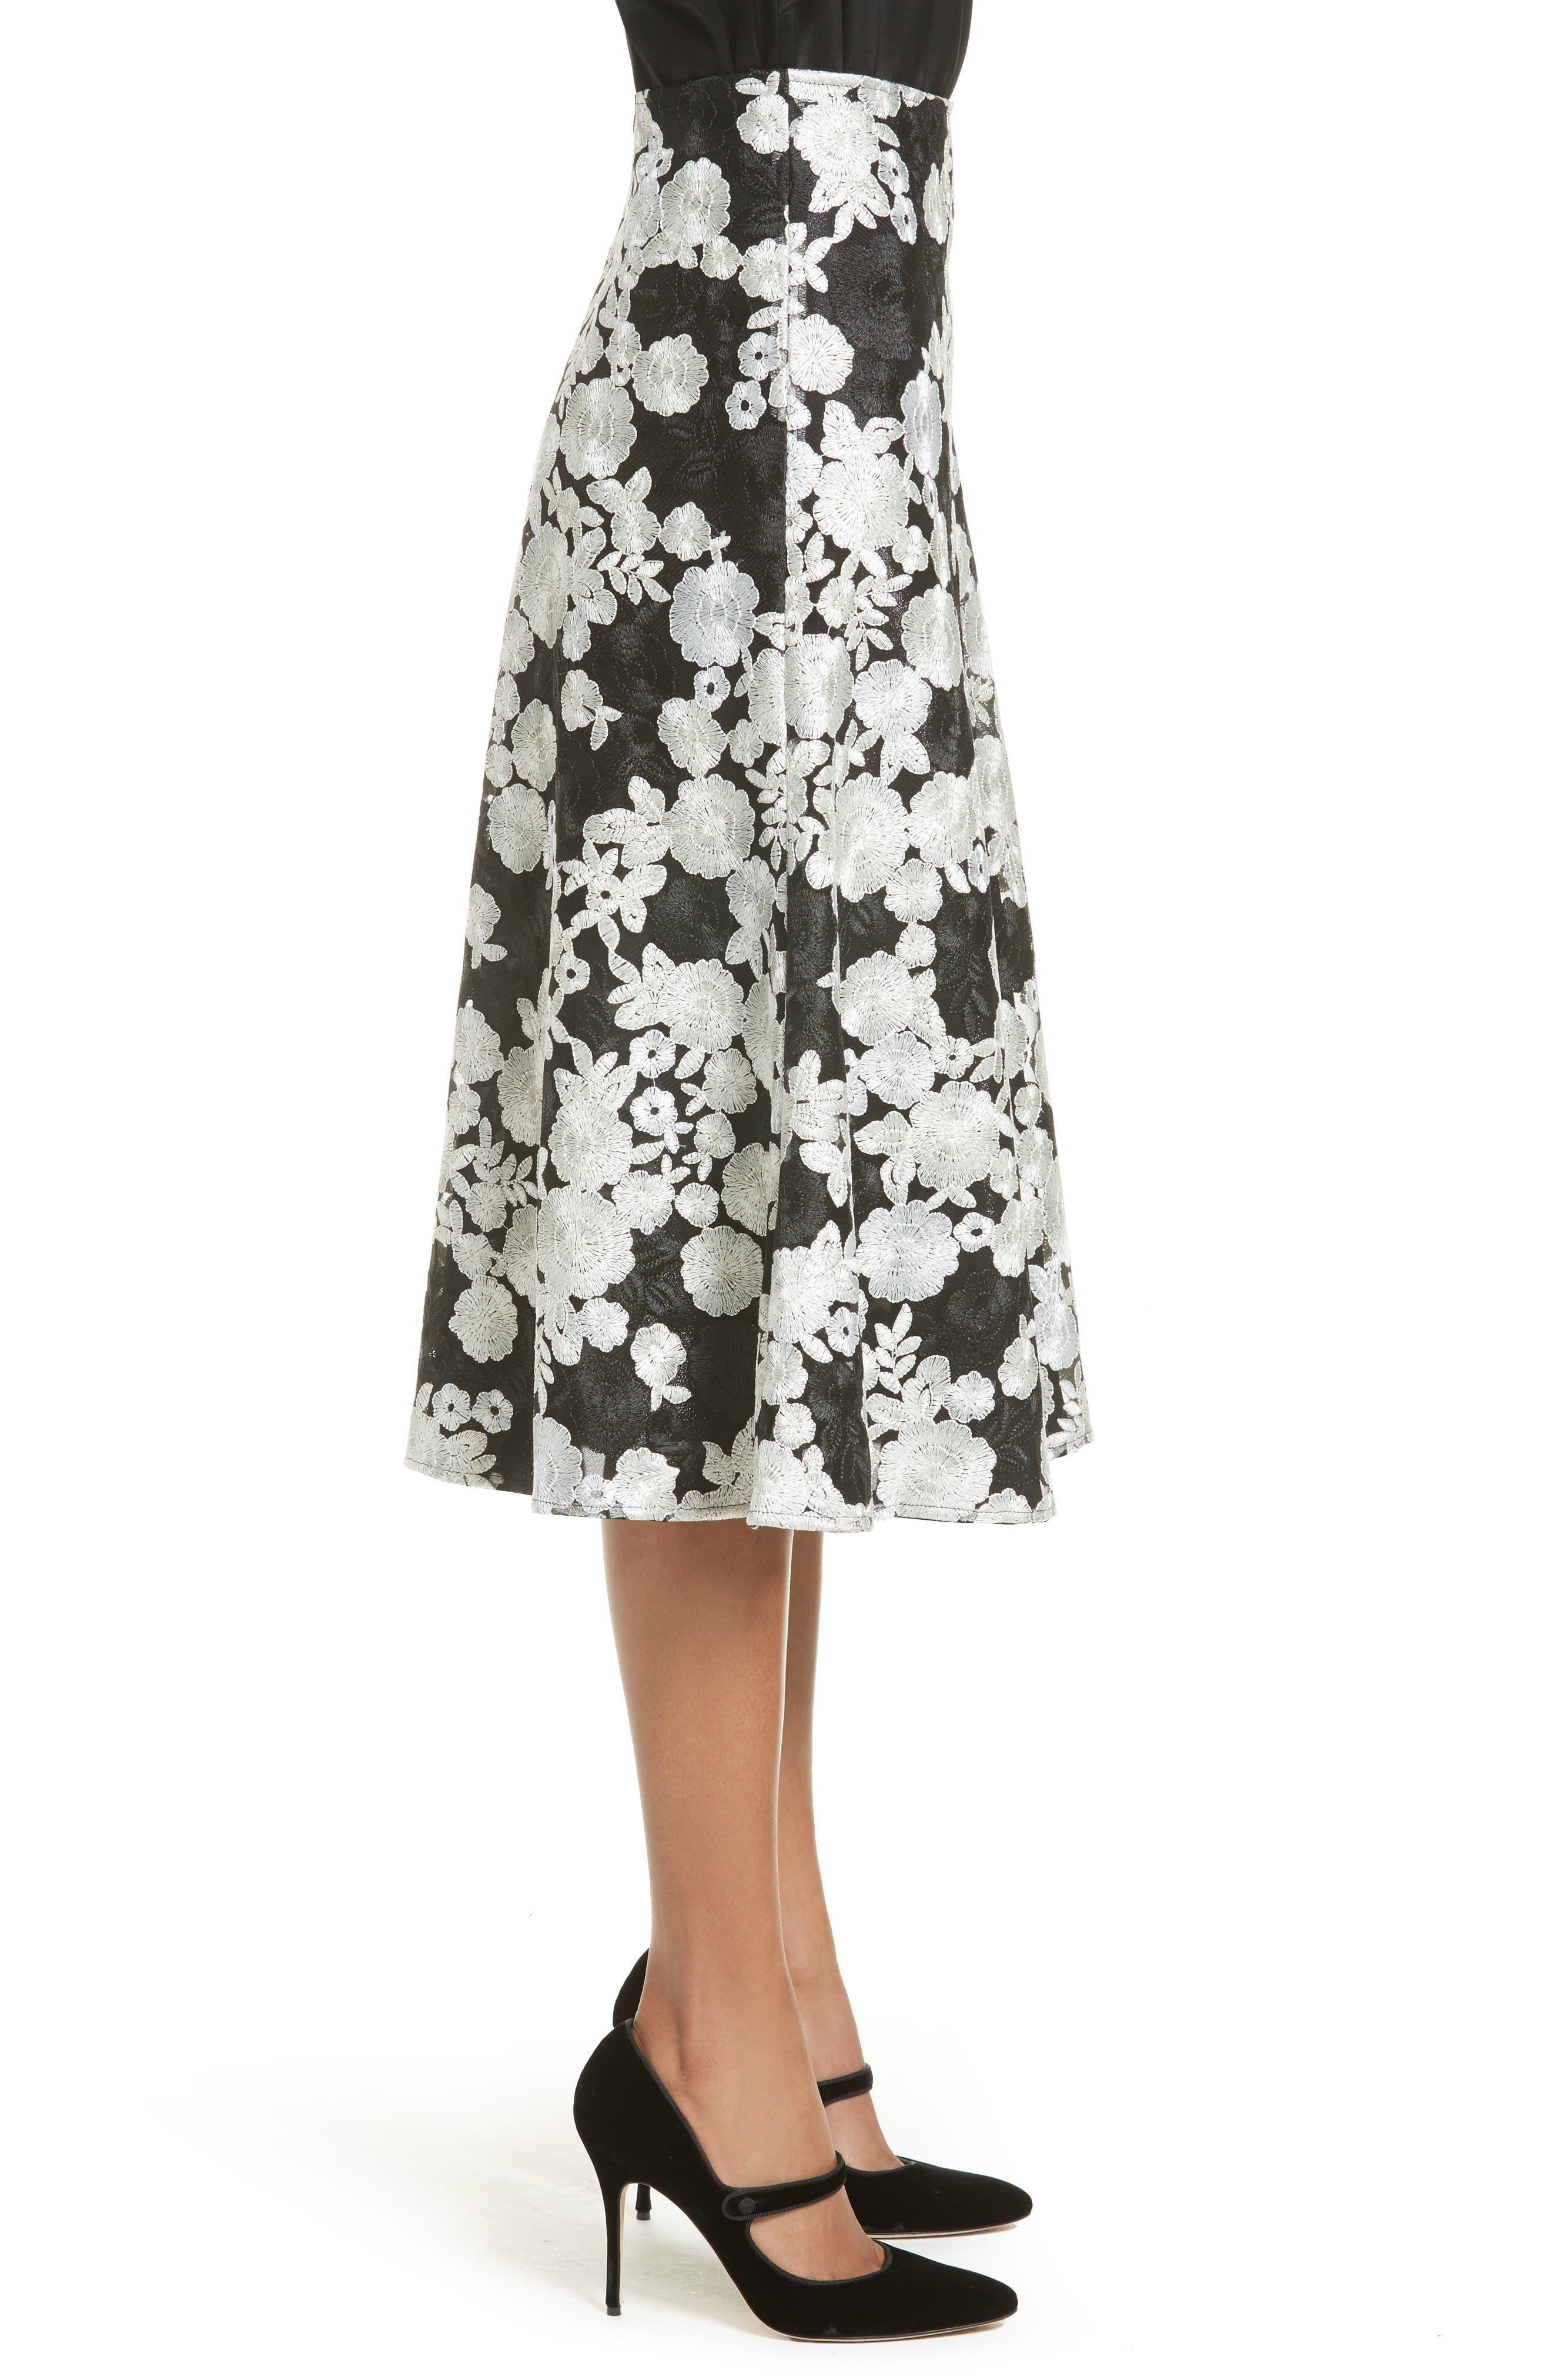 St. John Floral Embroidered Flared Skirt,                             Alternate thumbnail 3, color,                             001